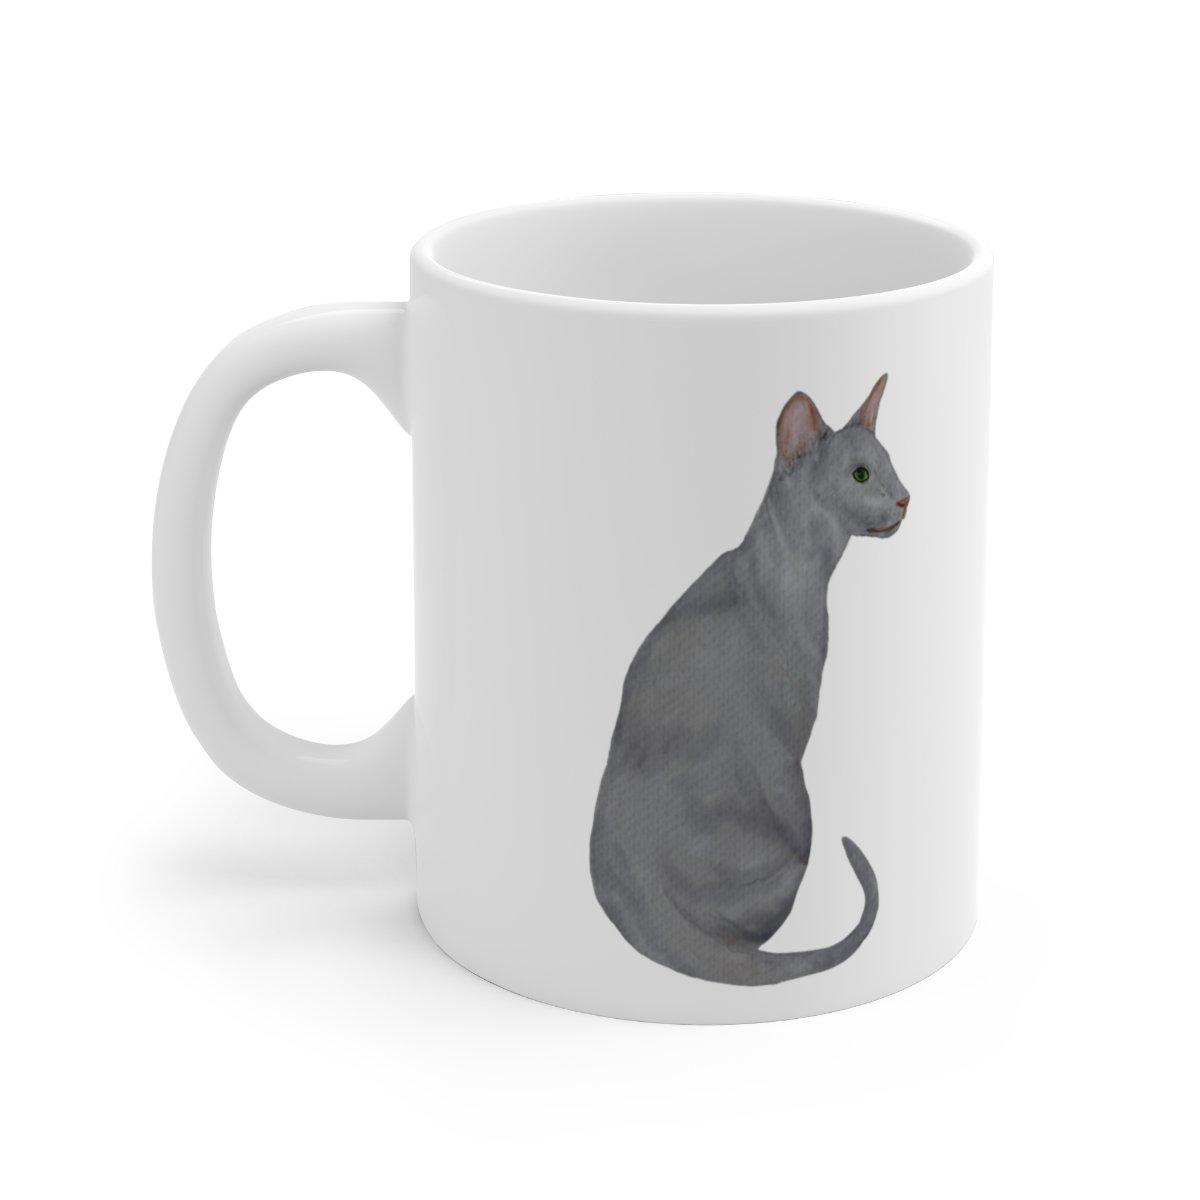 CERAMIC 11oz MUG - CAT STYLE #1662  Item #739537